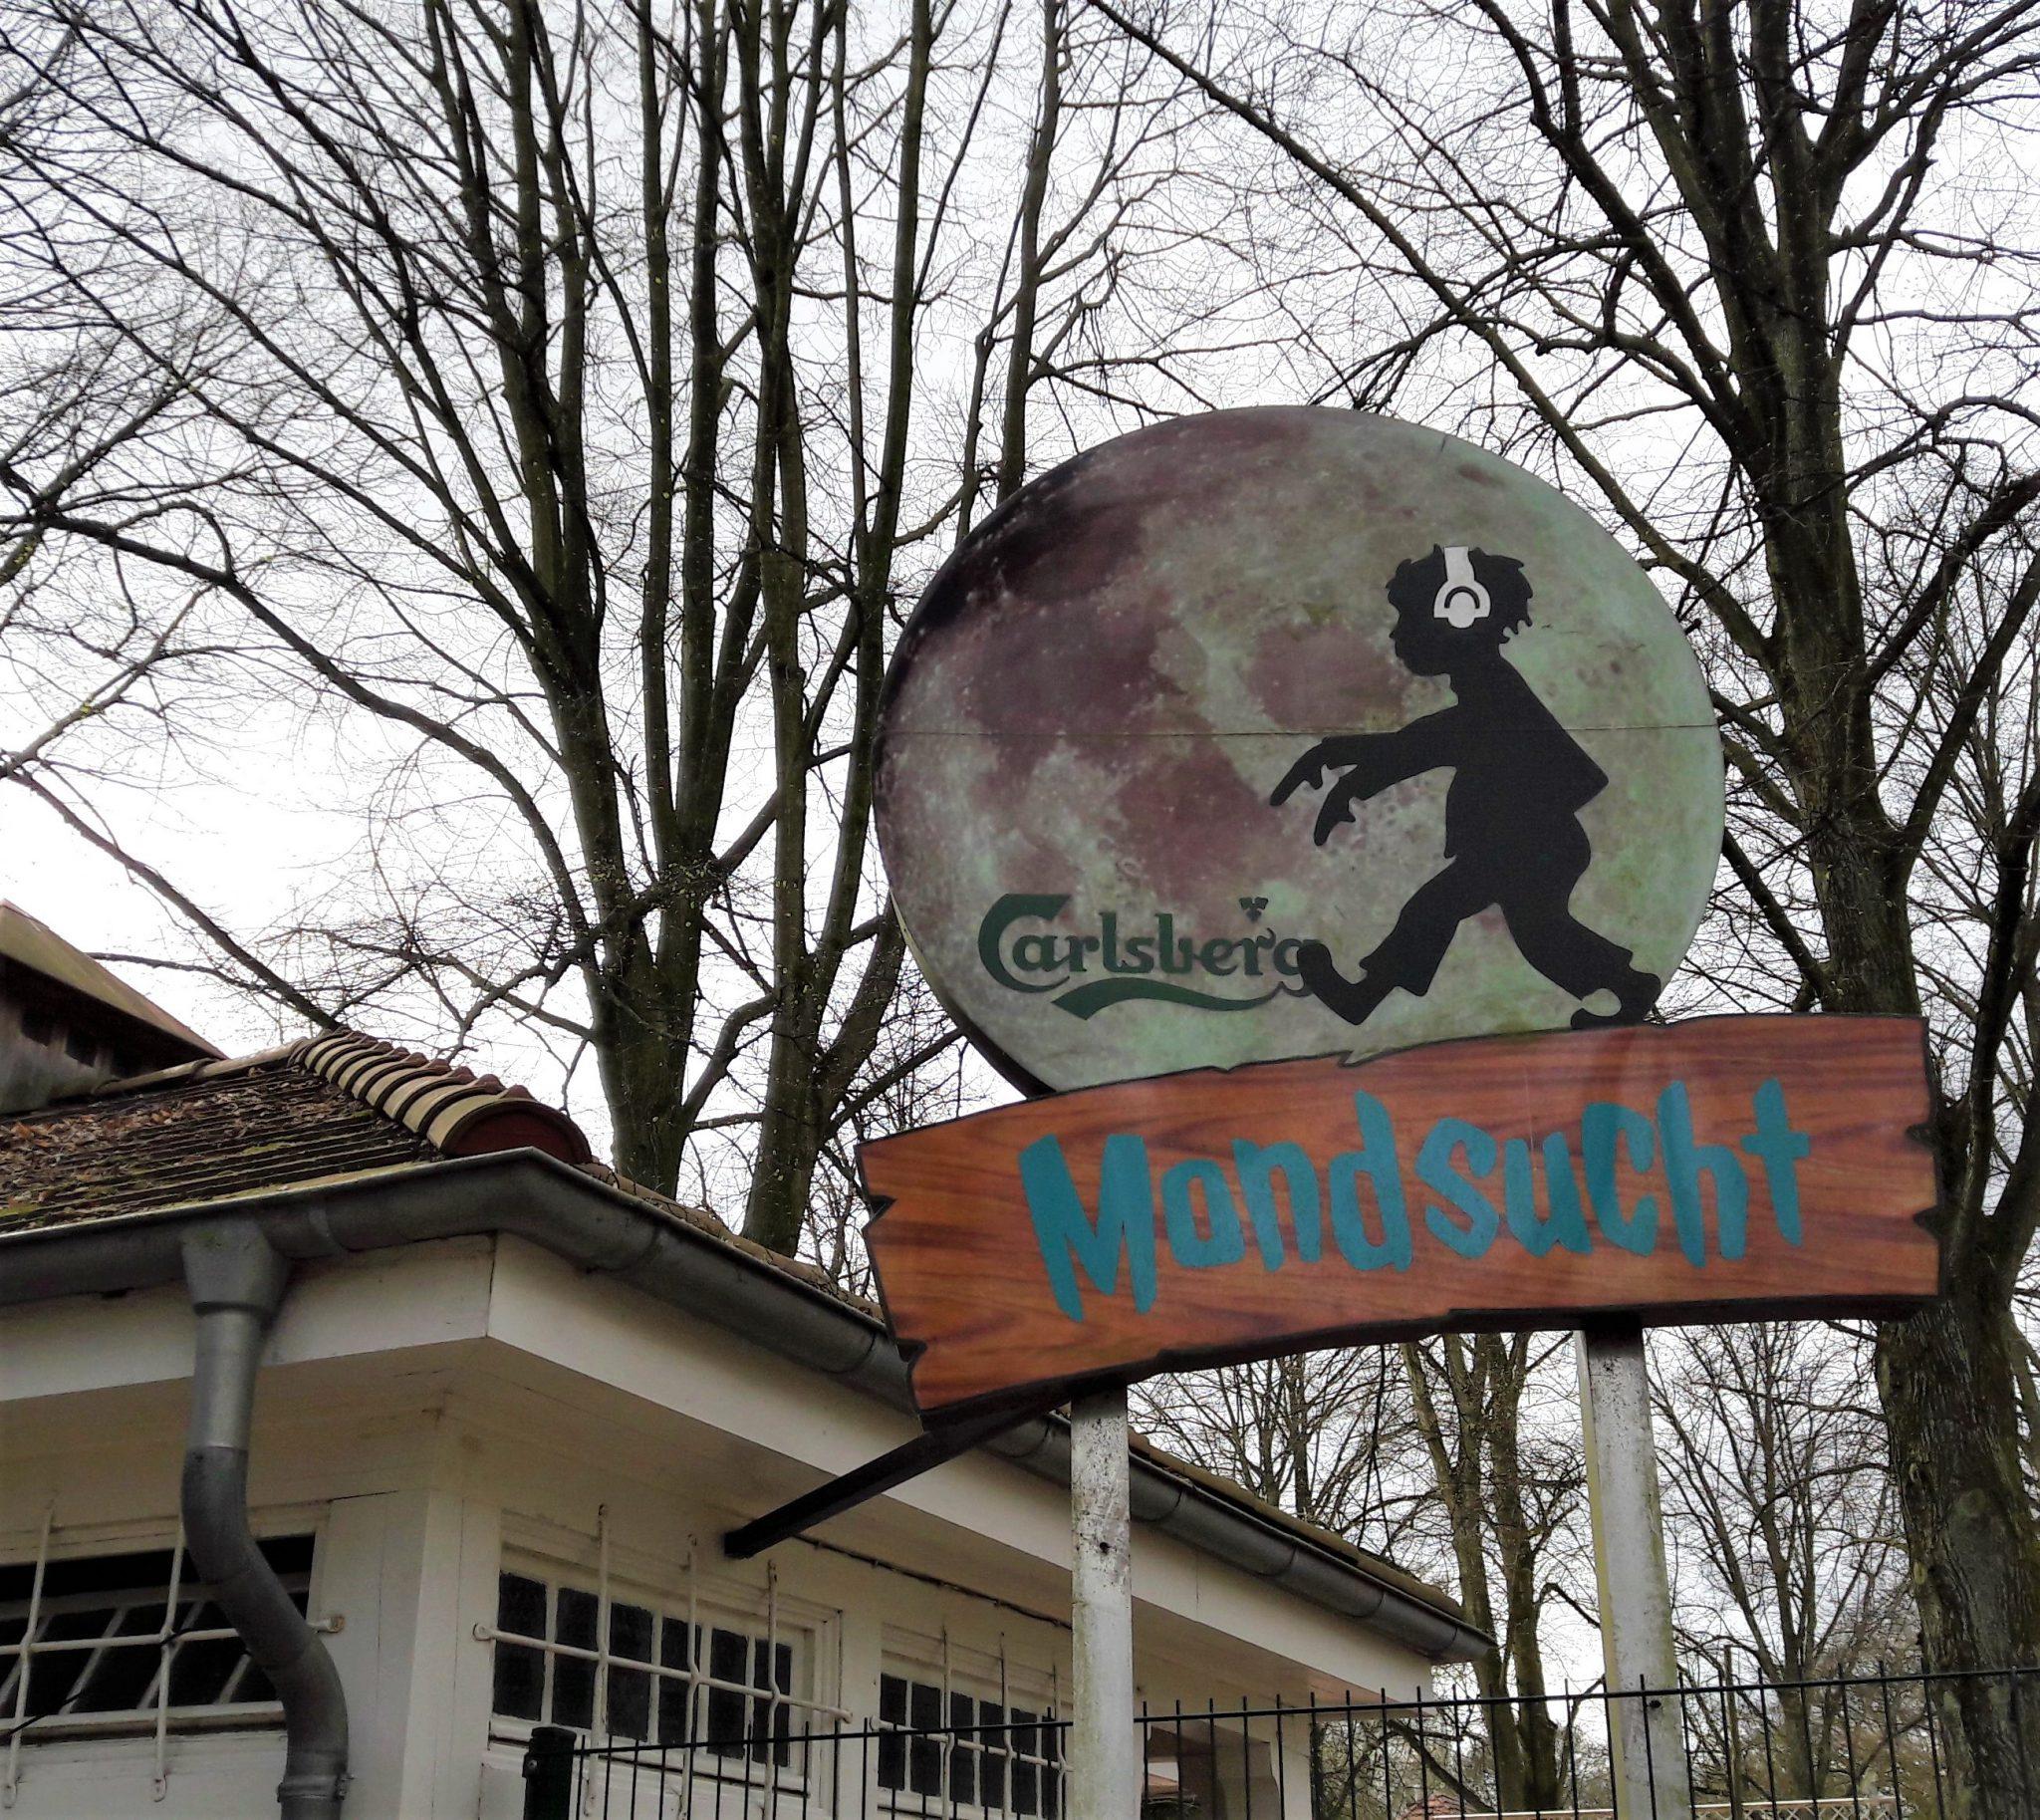 Der Stadtpark Hamburgs Grosste Wellness Oase Natur Pur Typisch Hamburch Lieblingsplatze